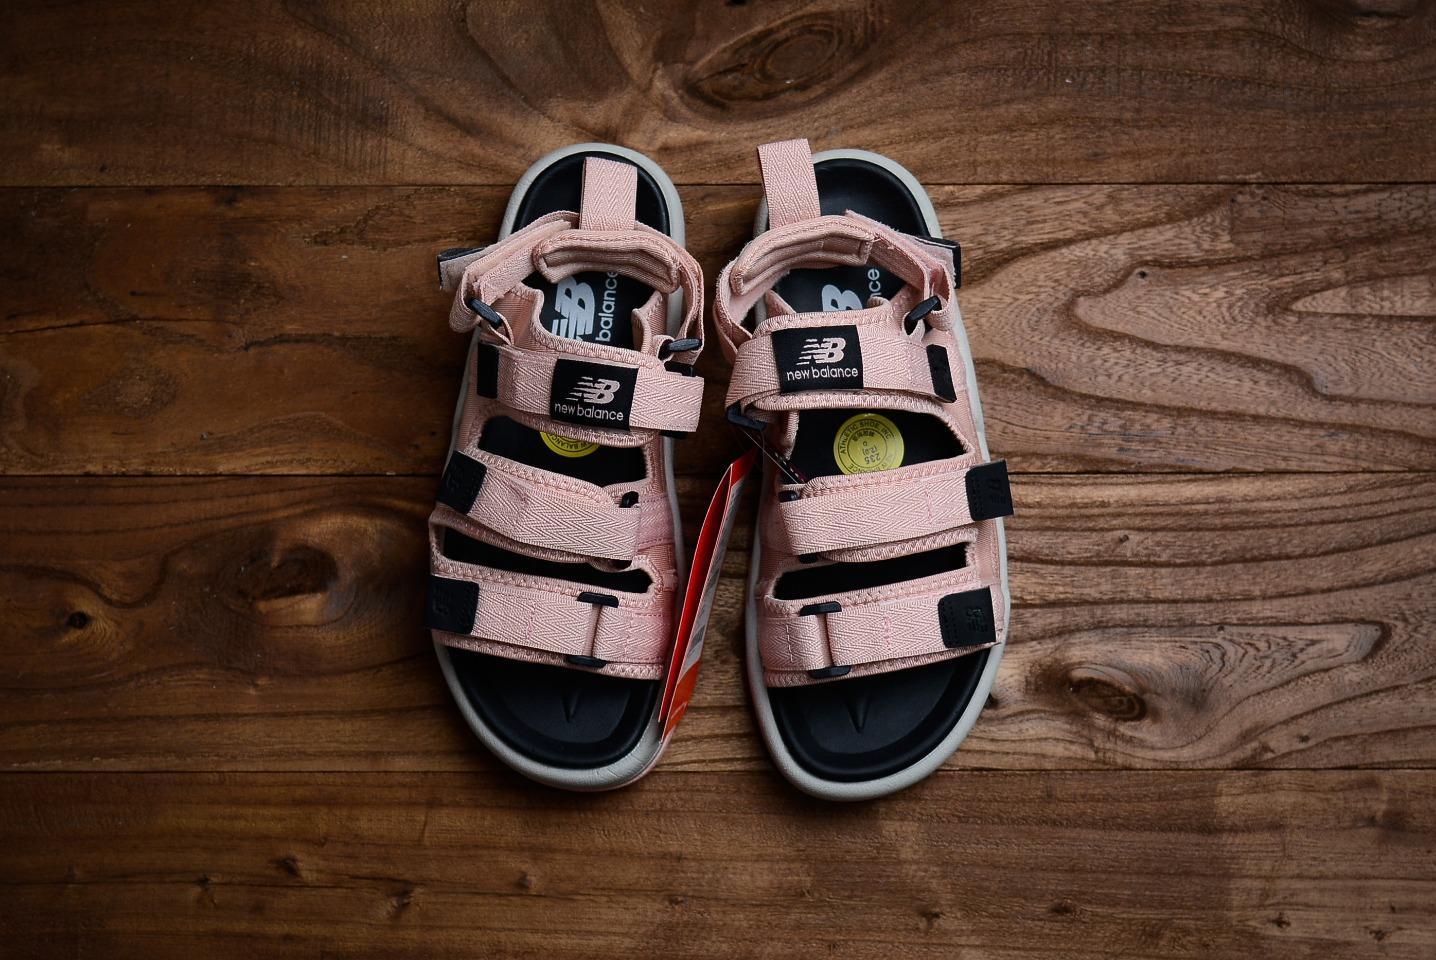 New Balance NB凉鞋一代 全粉 休闲凉鞋上架